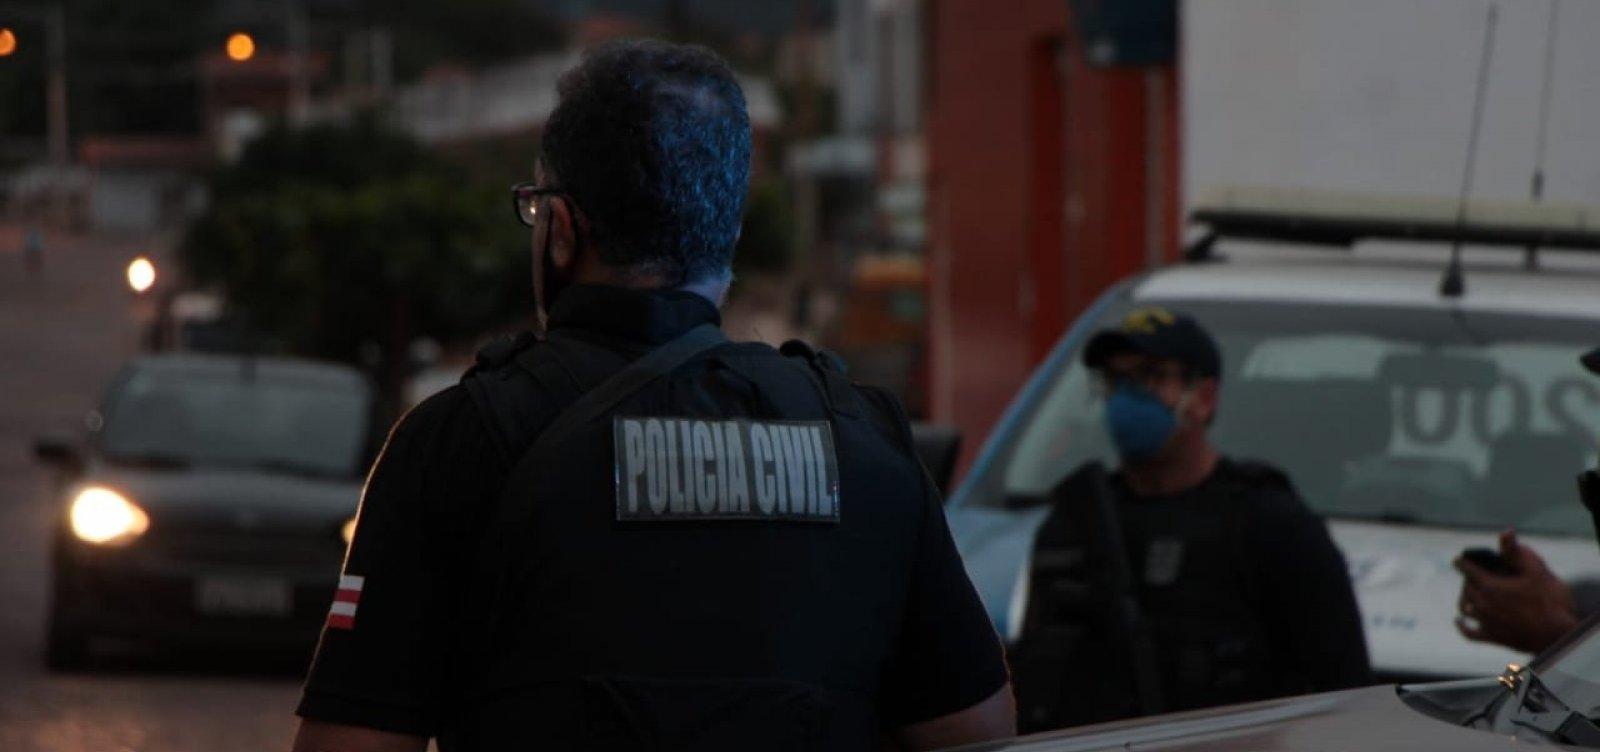 Polícia recupera R$ 6,3 mil furtados por vigilante de banco no norte do estado